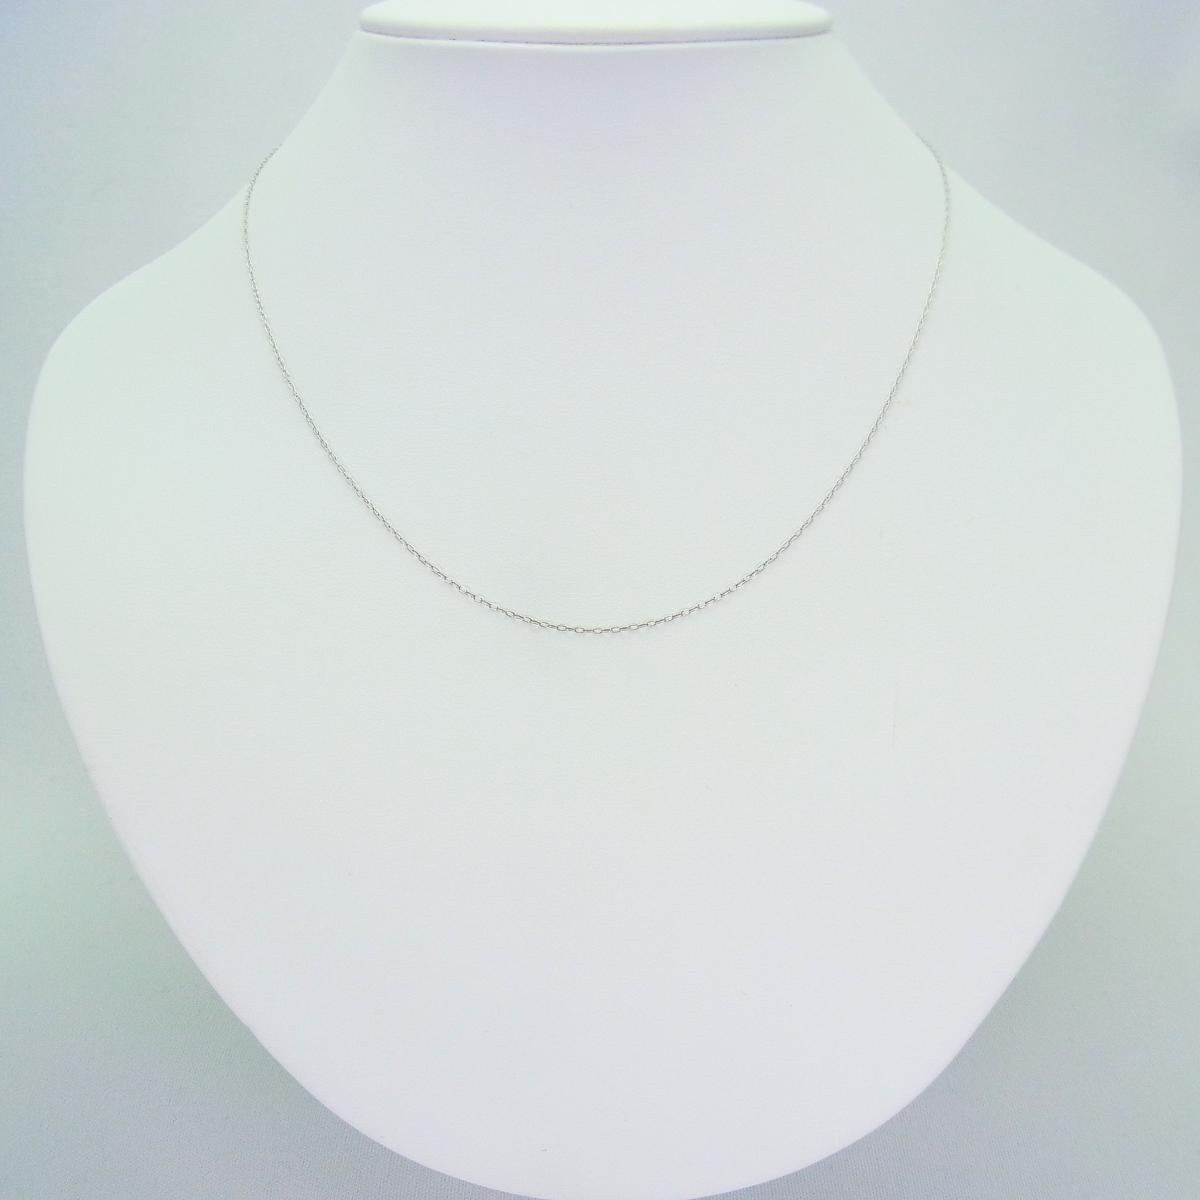 Pt850(プラチナ850) アズキ チェーン 45cm[ch-23]